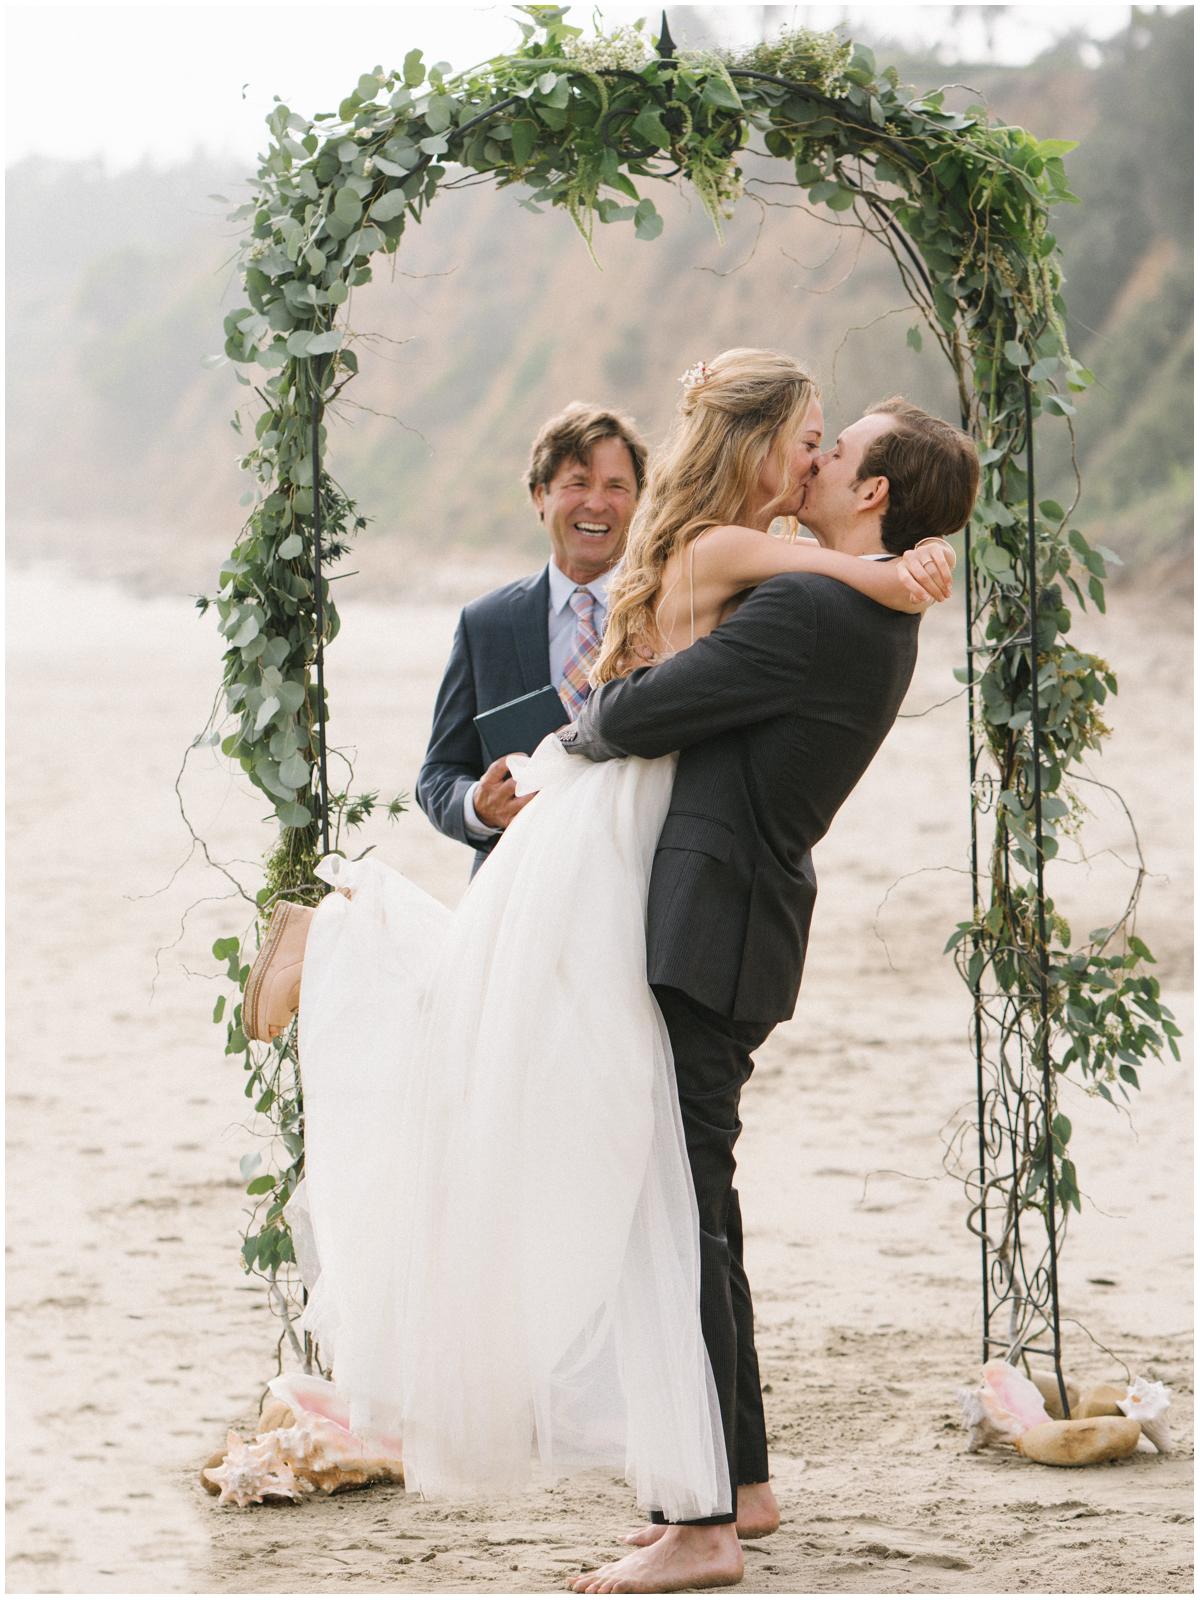 Santa Babara Elopement Wedding Photographer - Pinnel Photography-01-10.jpg